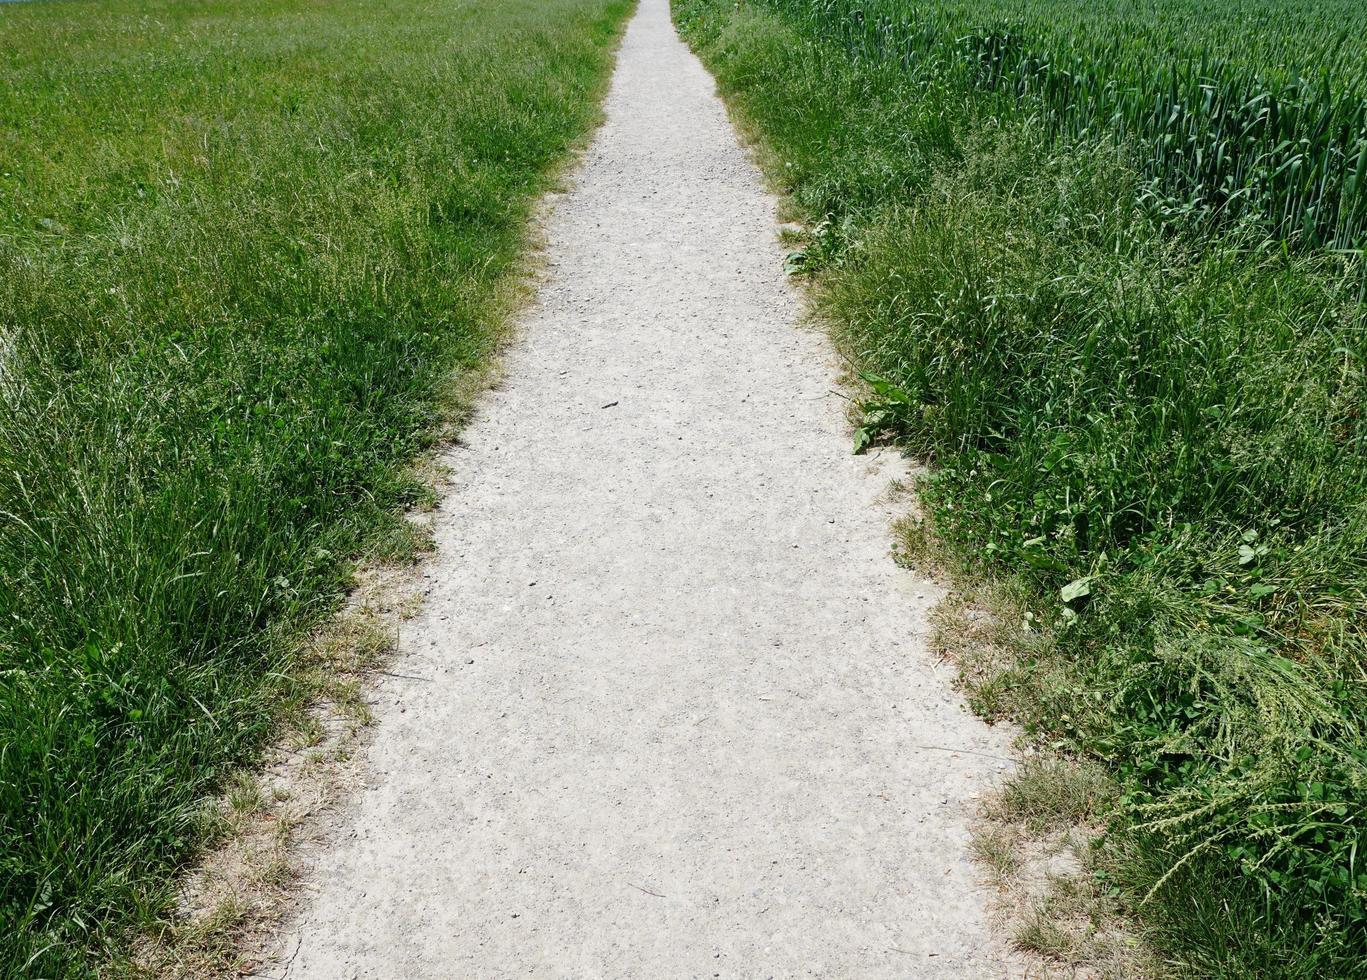 percorso tra due campi verdi foto